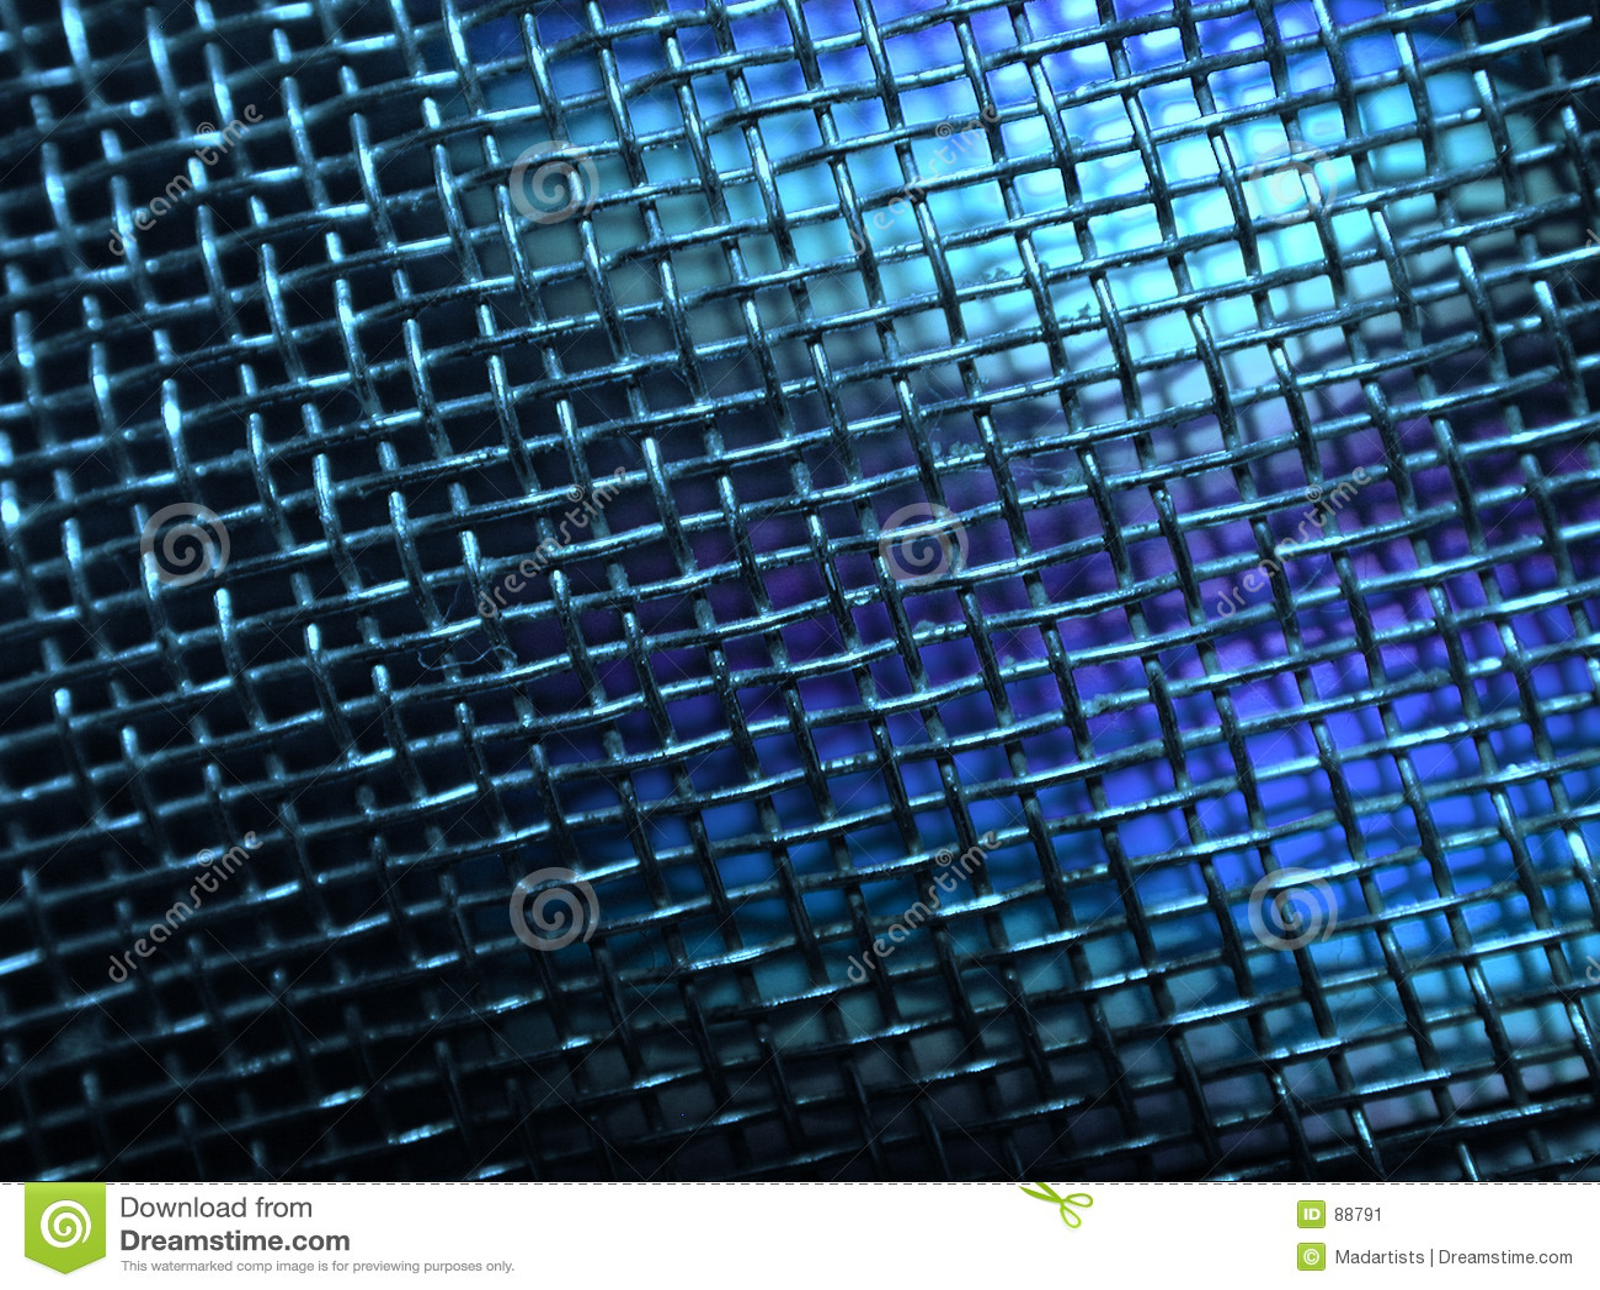 Grunge καλώδιο φωτογραφιών μετάλλων πλέγματος